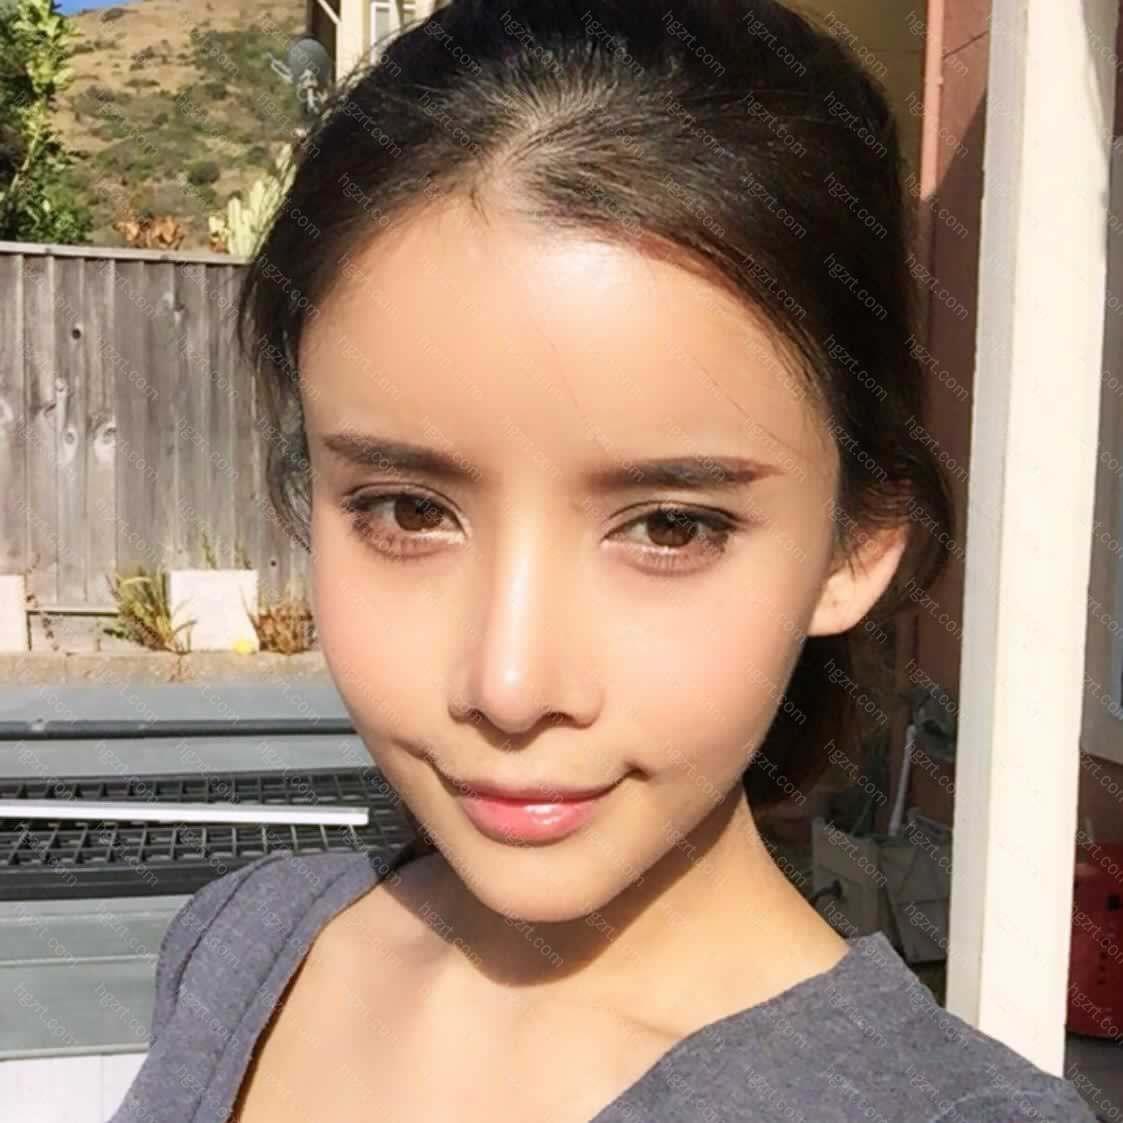 【V-LINE瓜子脸手术第125天】大家好我是莉莉